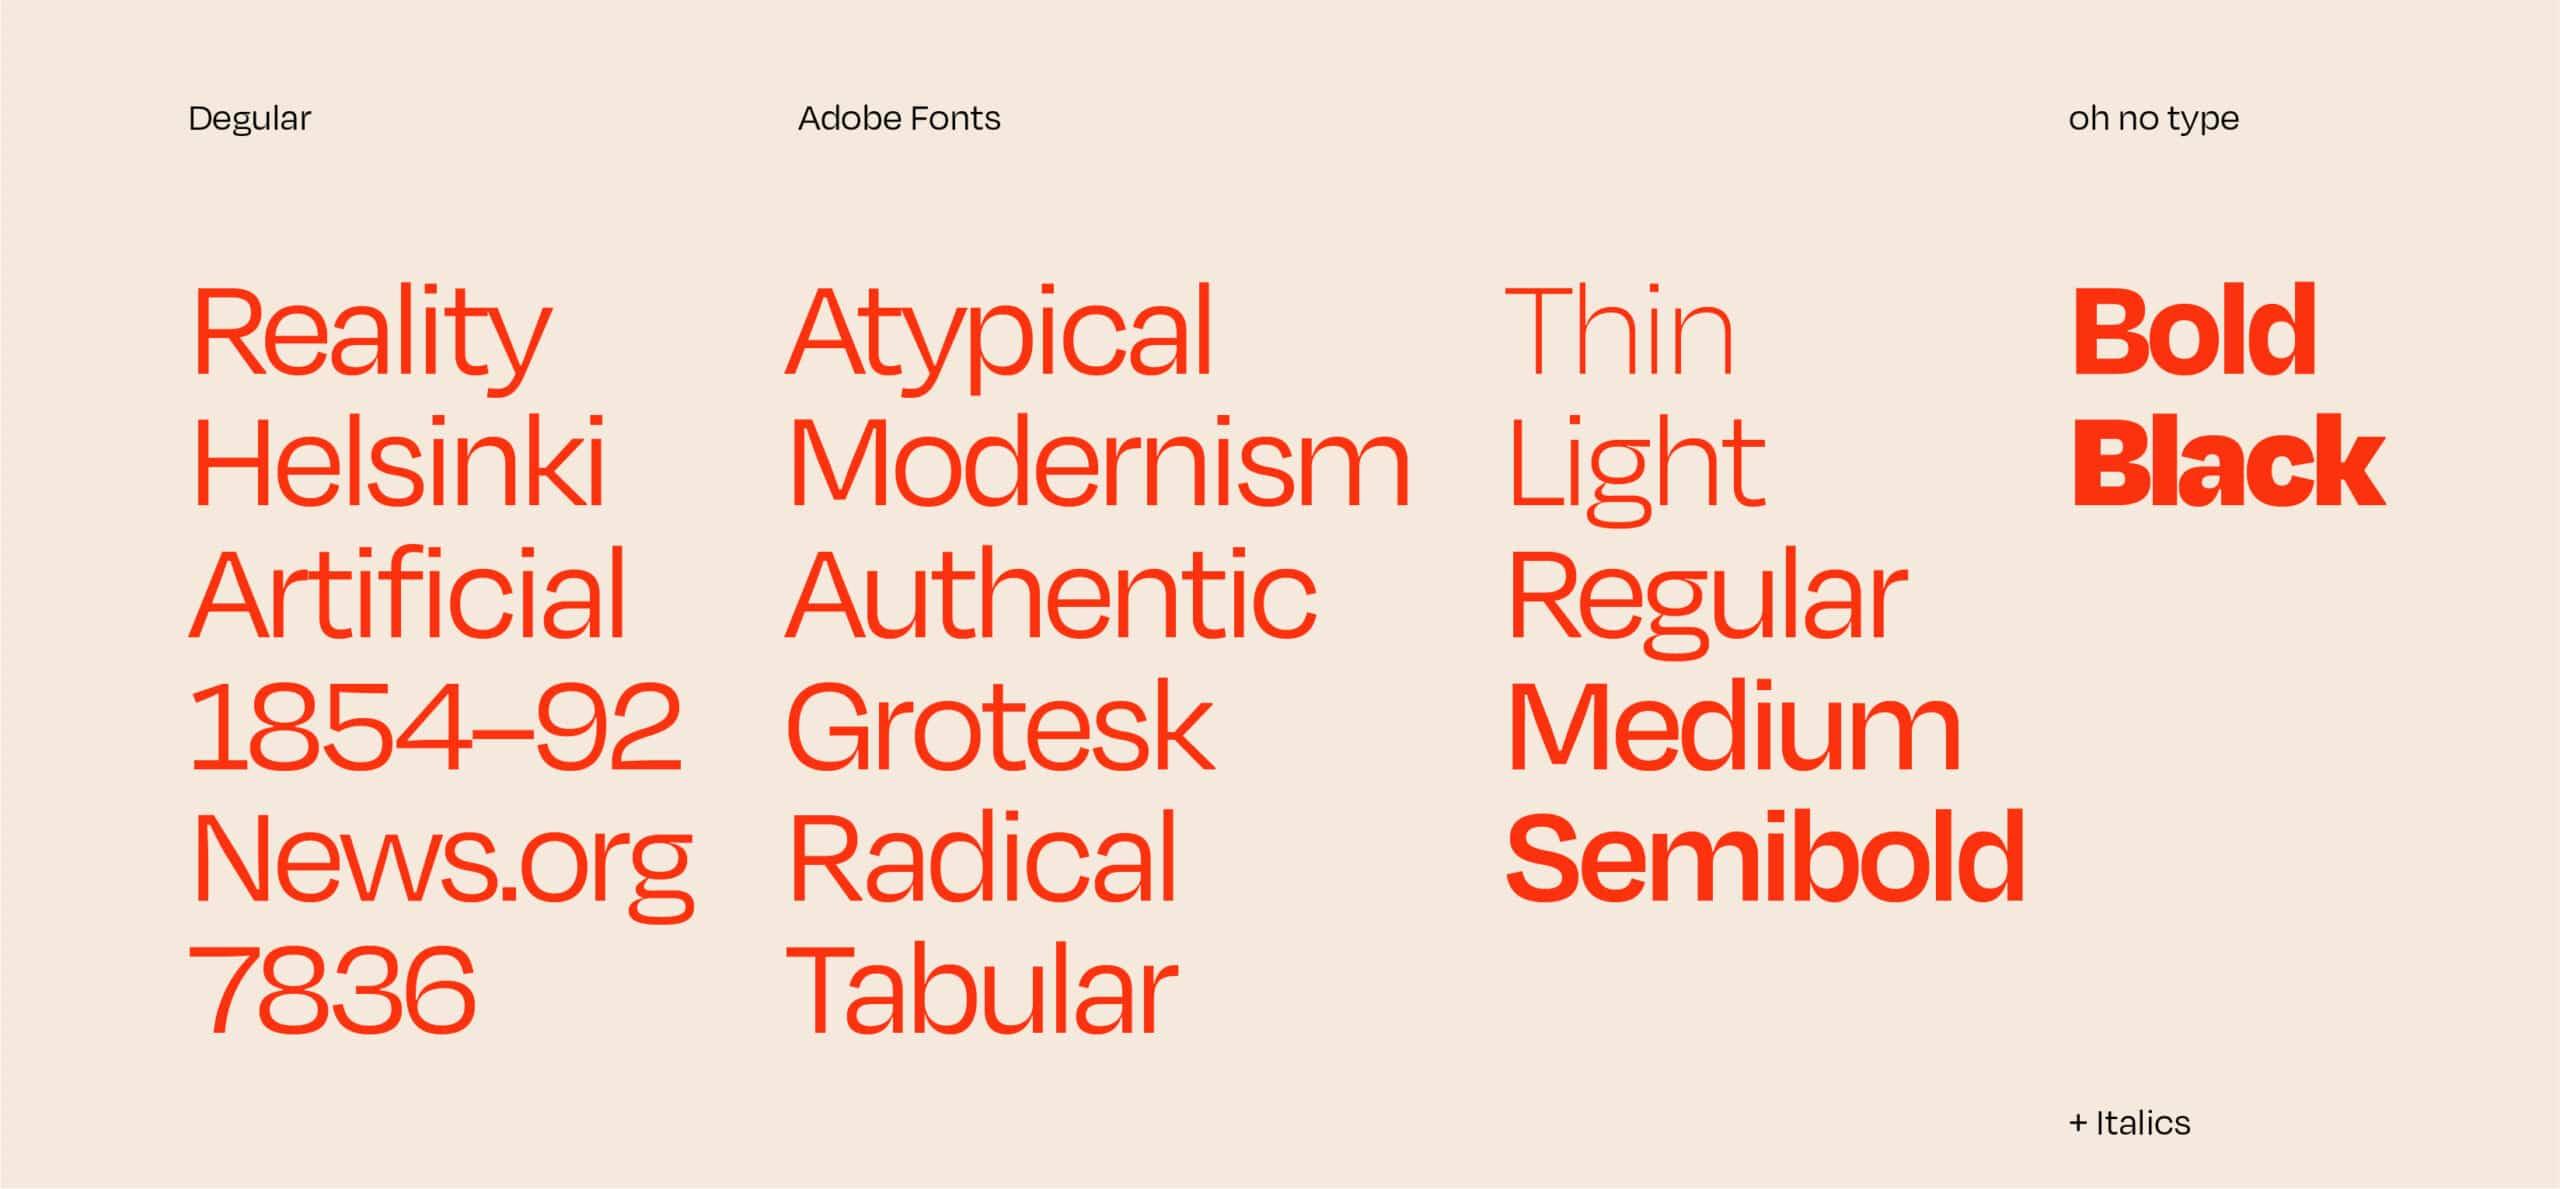 Top Adobe Fonts Degular